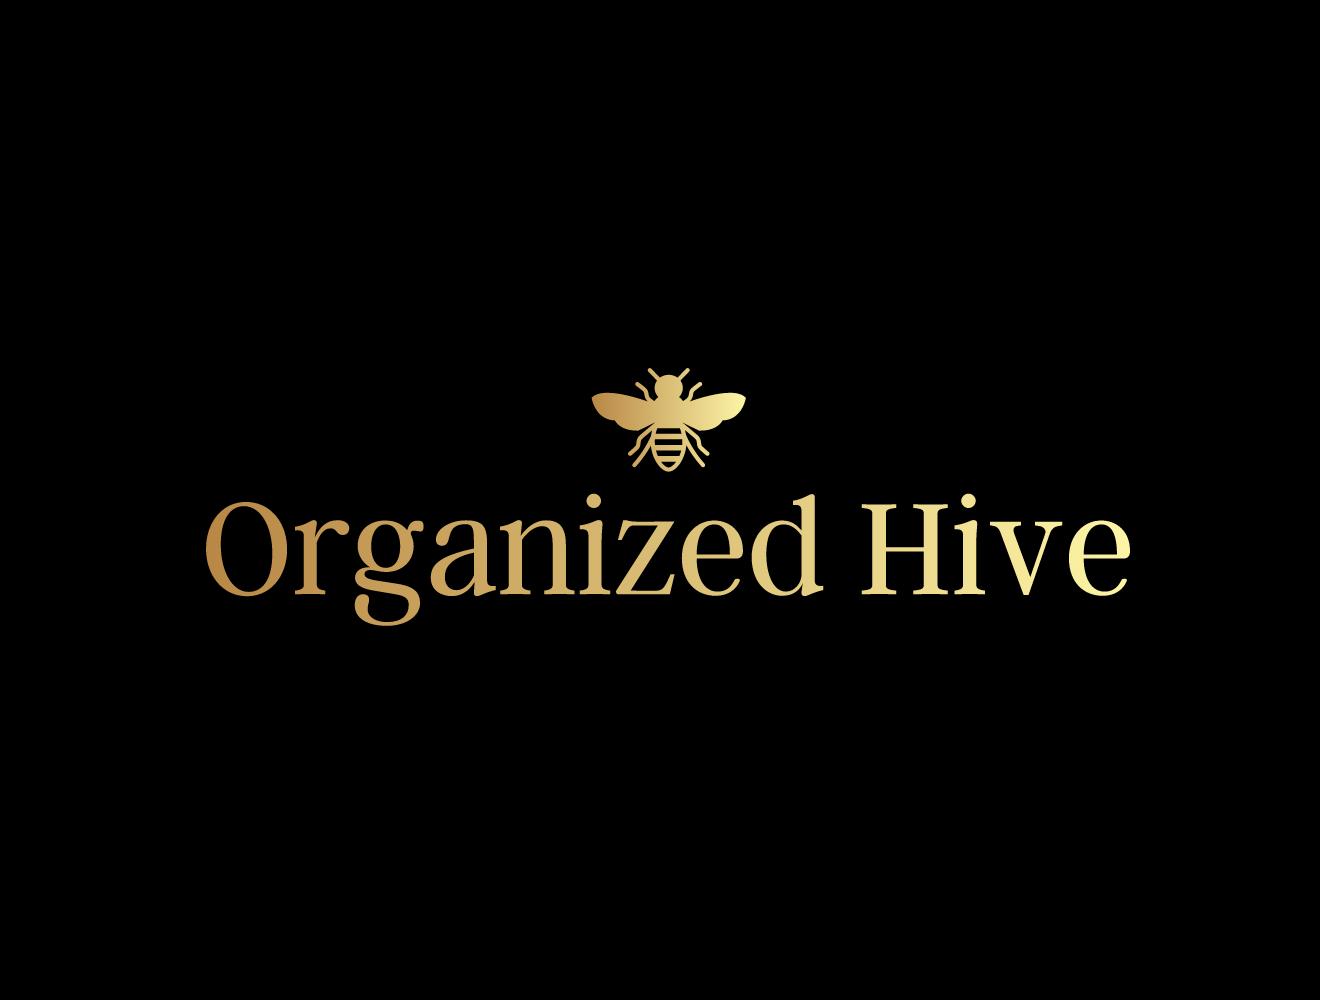 Organized Hive